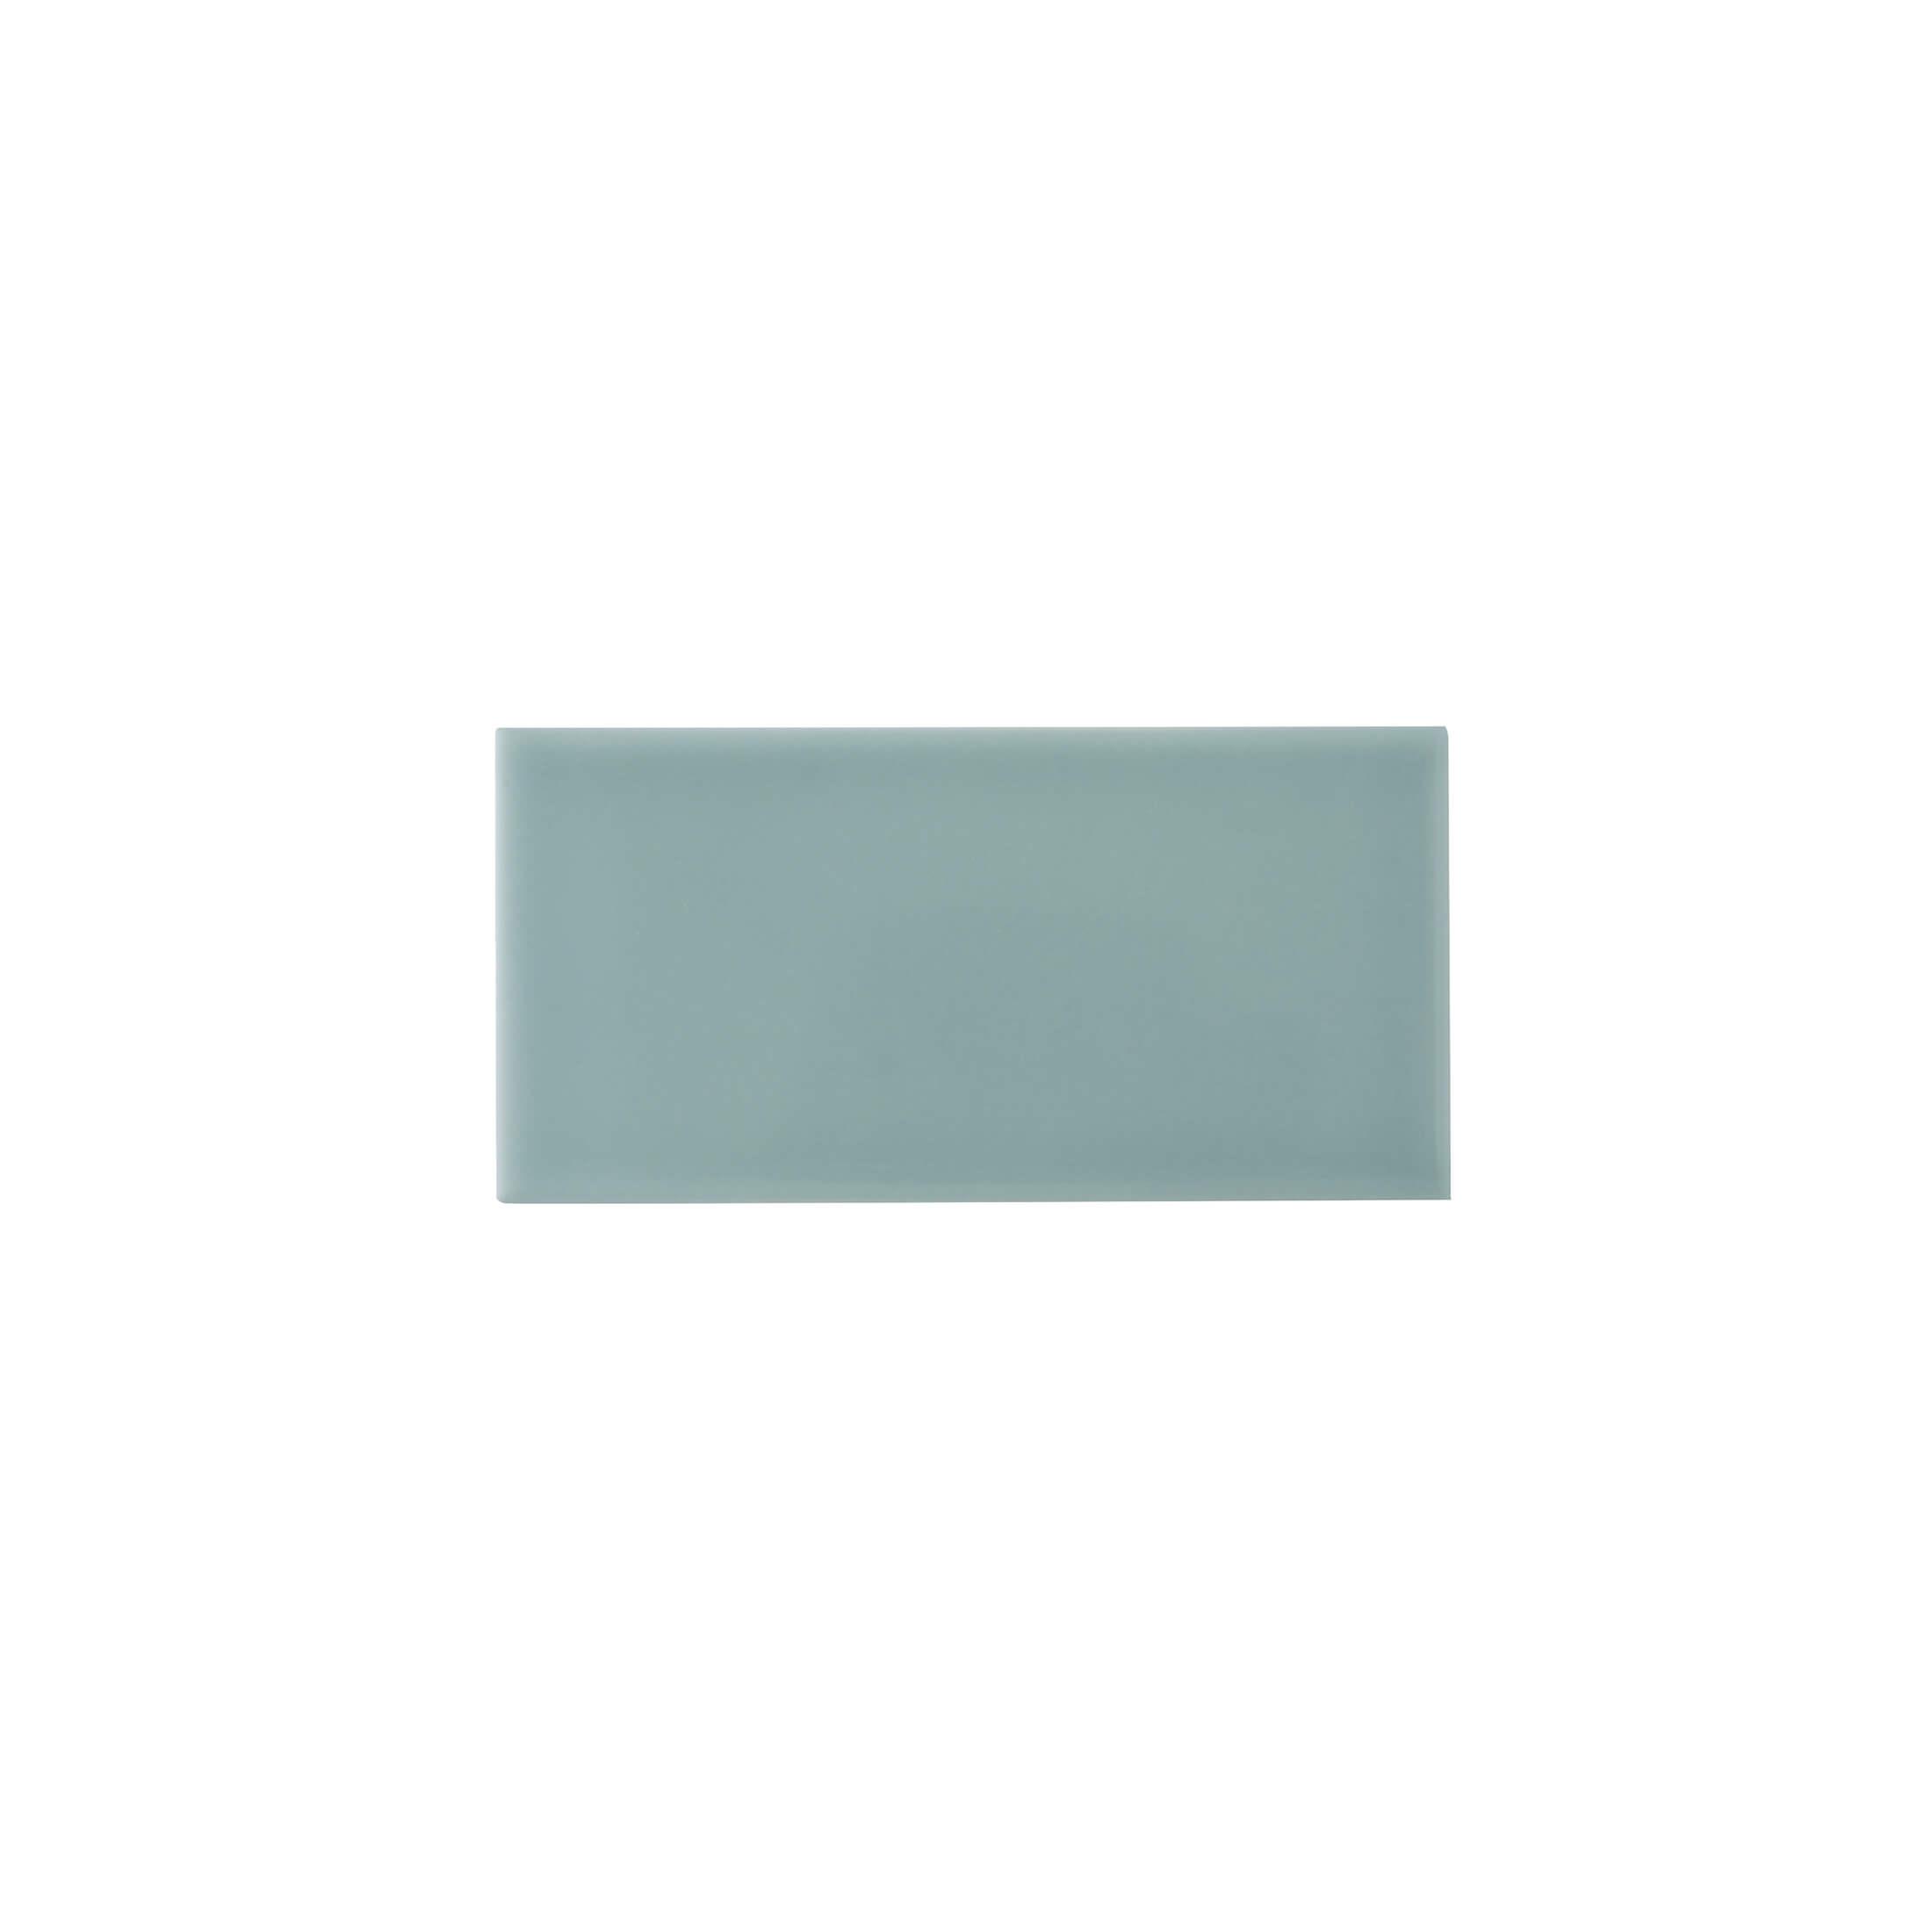 ADNE1100 - LISO PB - 7.5 cm X 15 cm